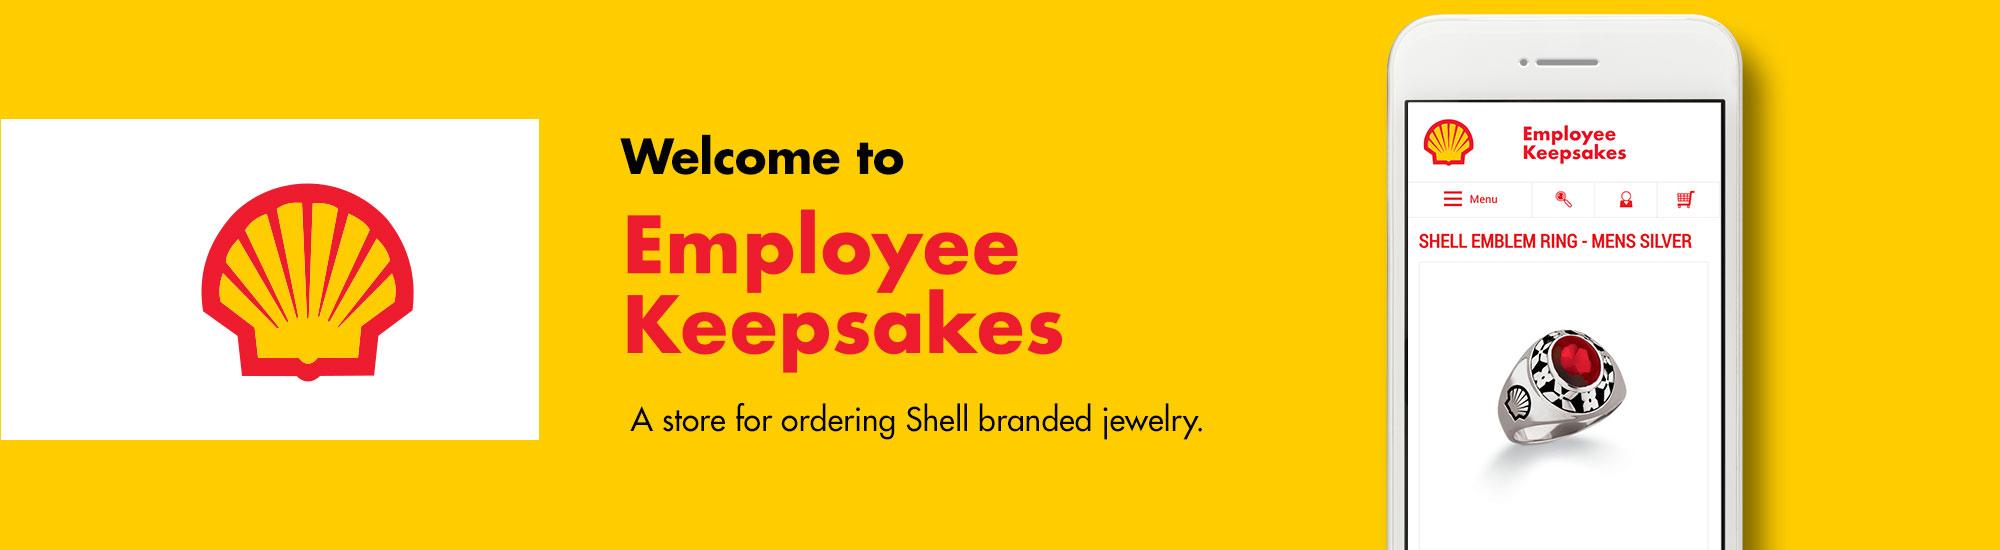 Welcome to Shell Employee Keepsakes